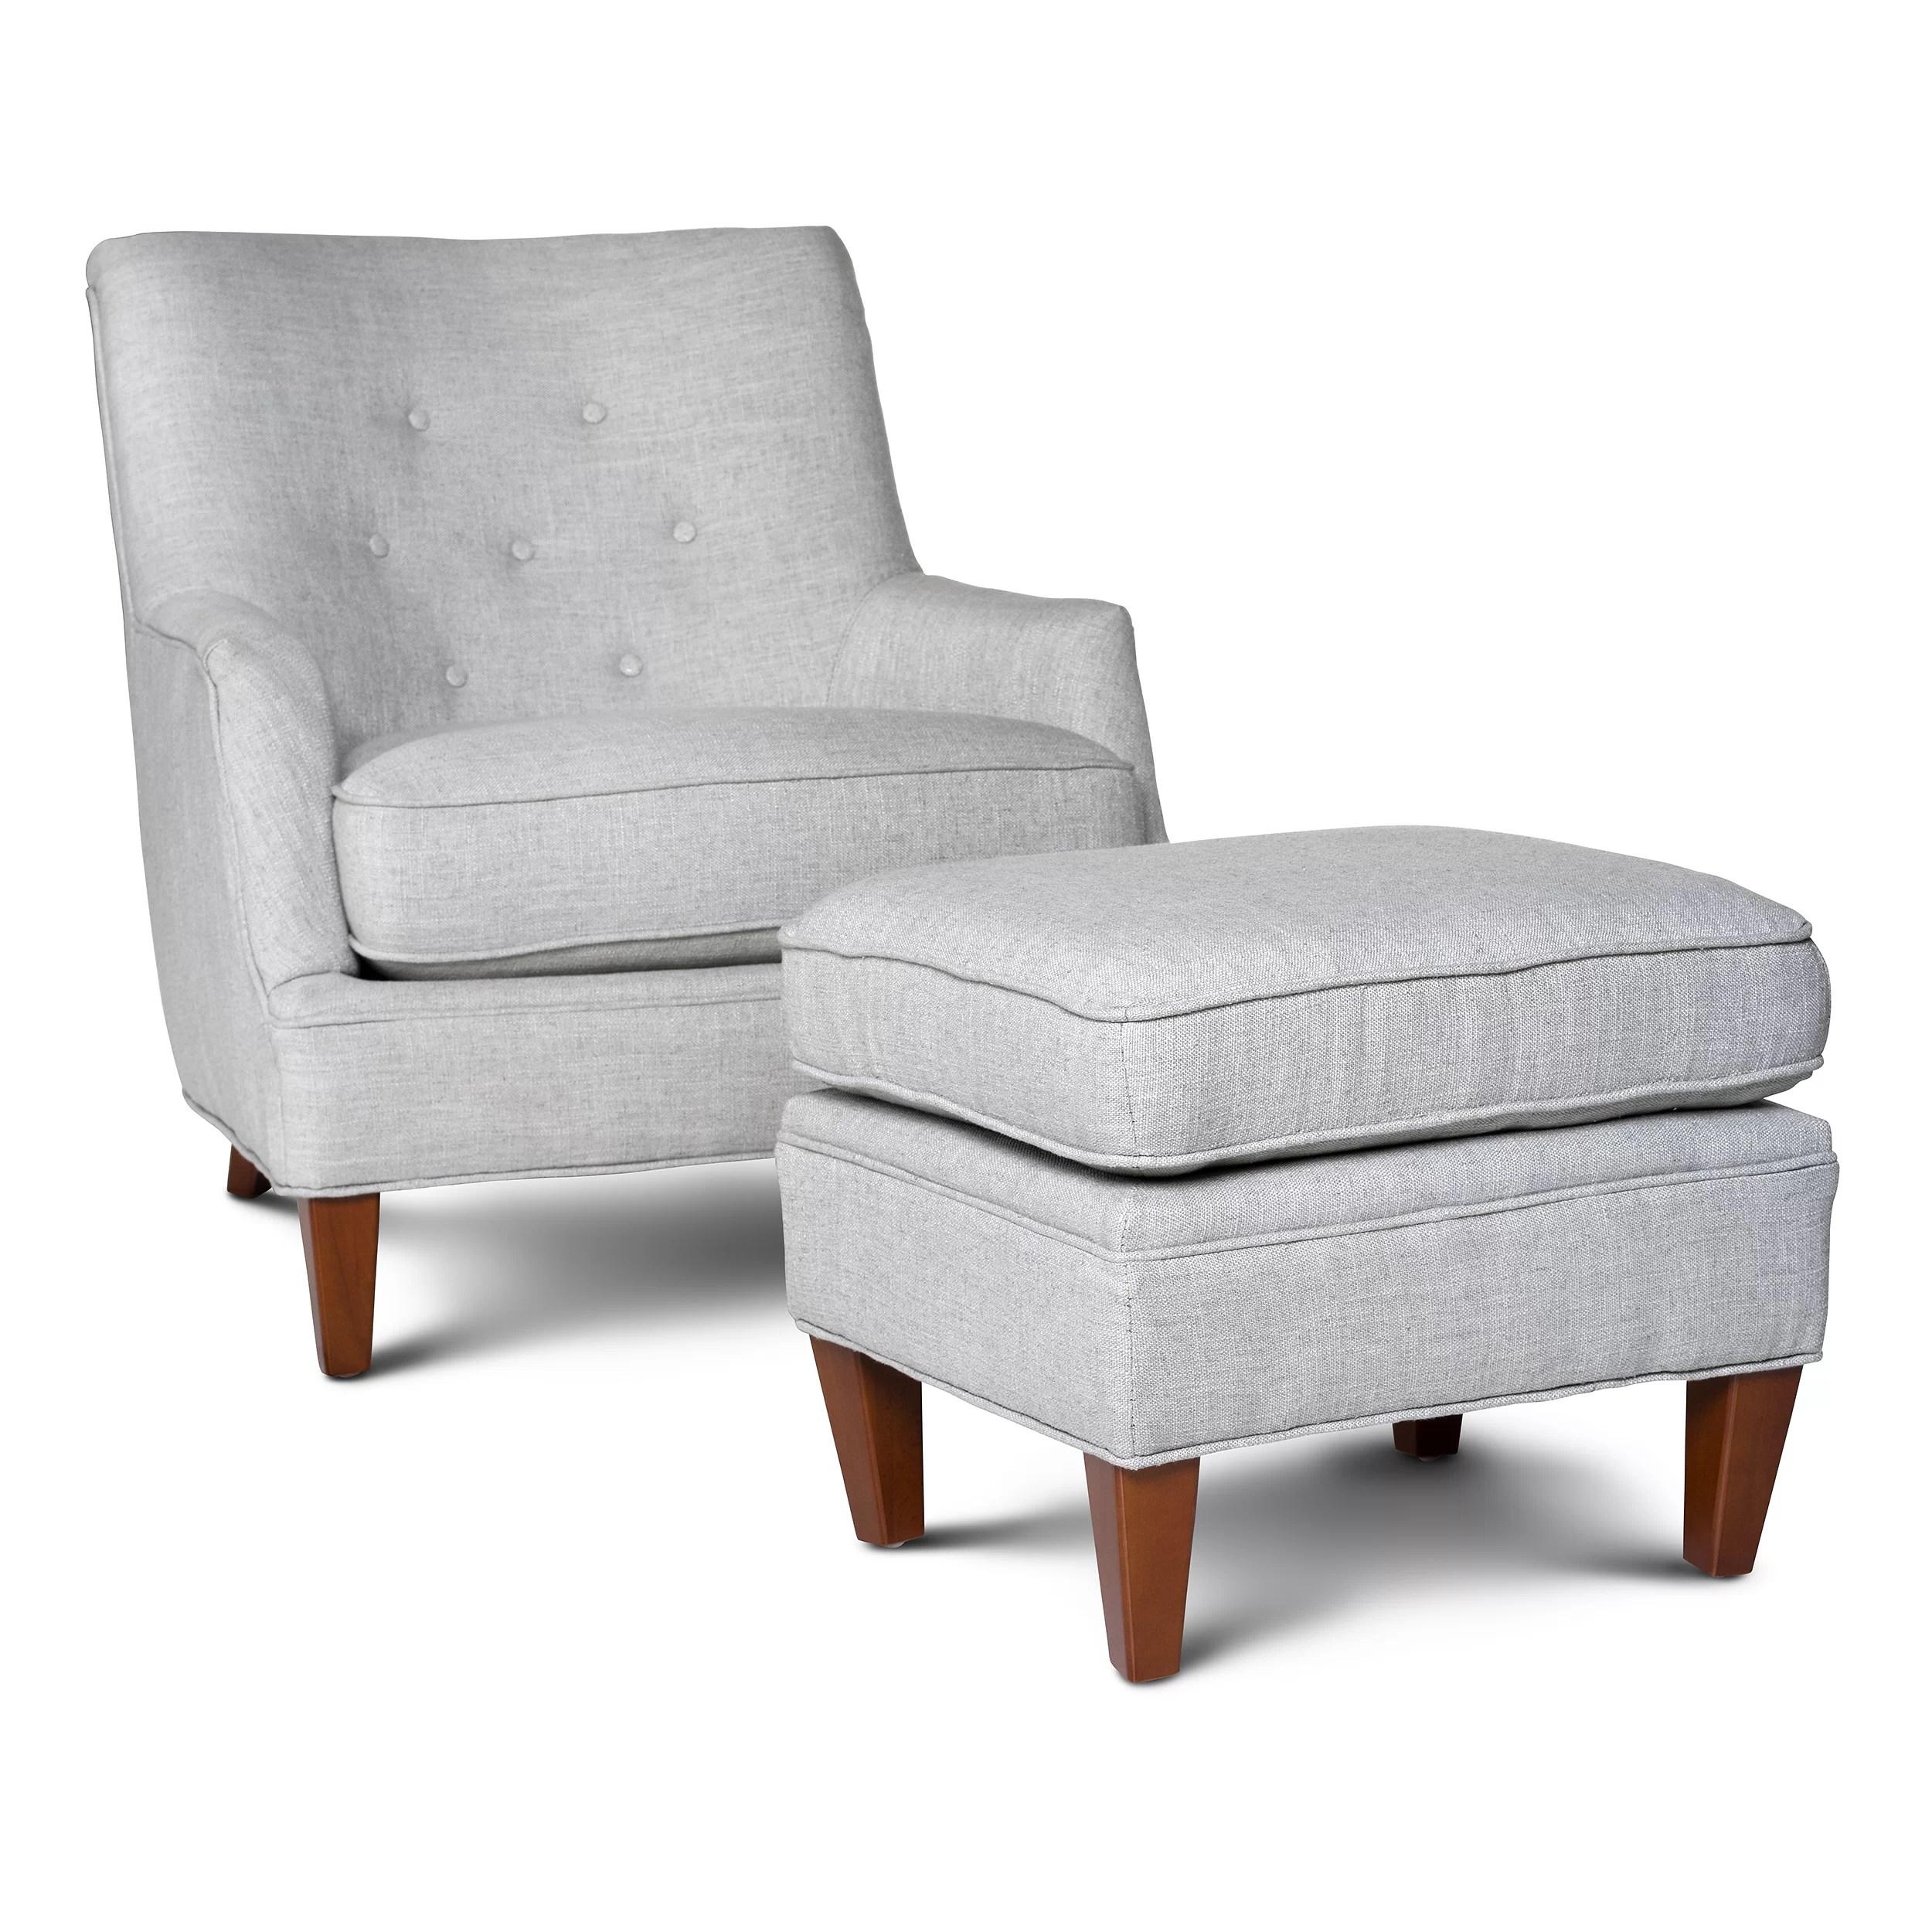 Opulence Home Fredrick Club Chair and Ottoman & Reviews